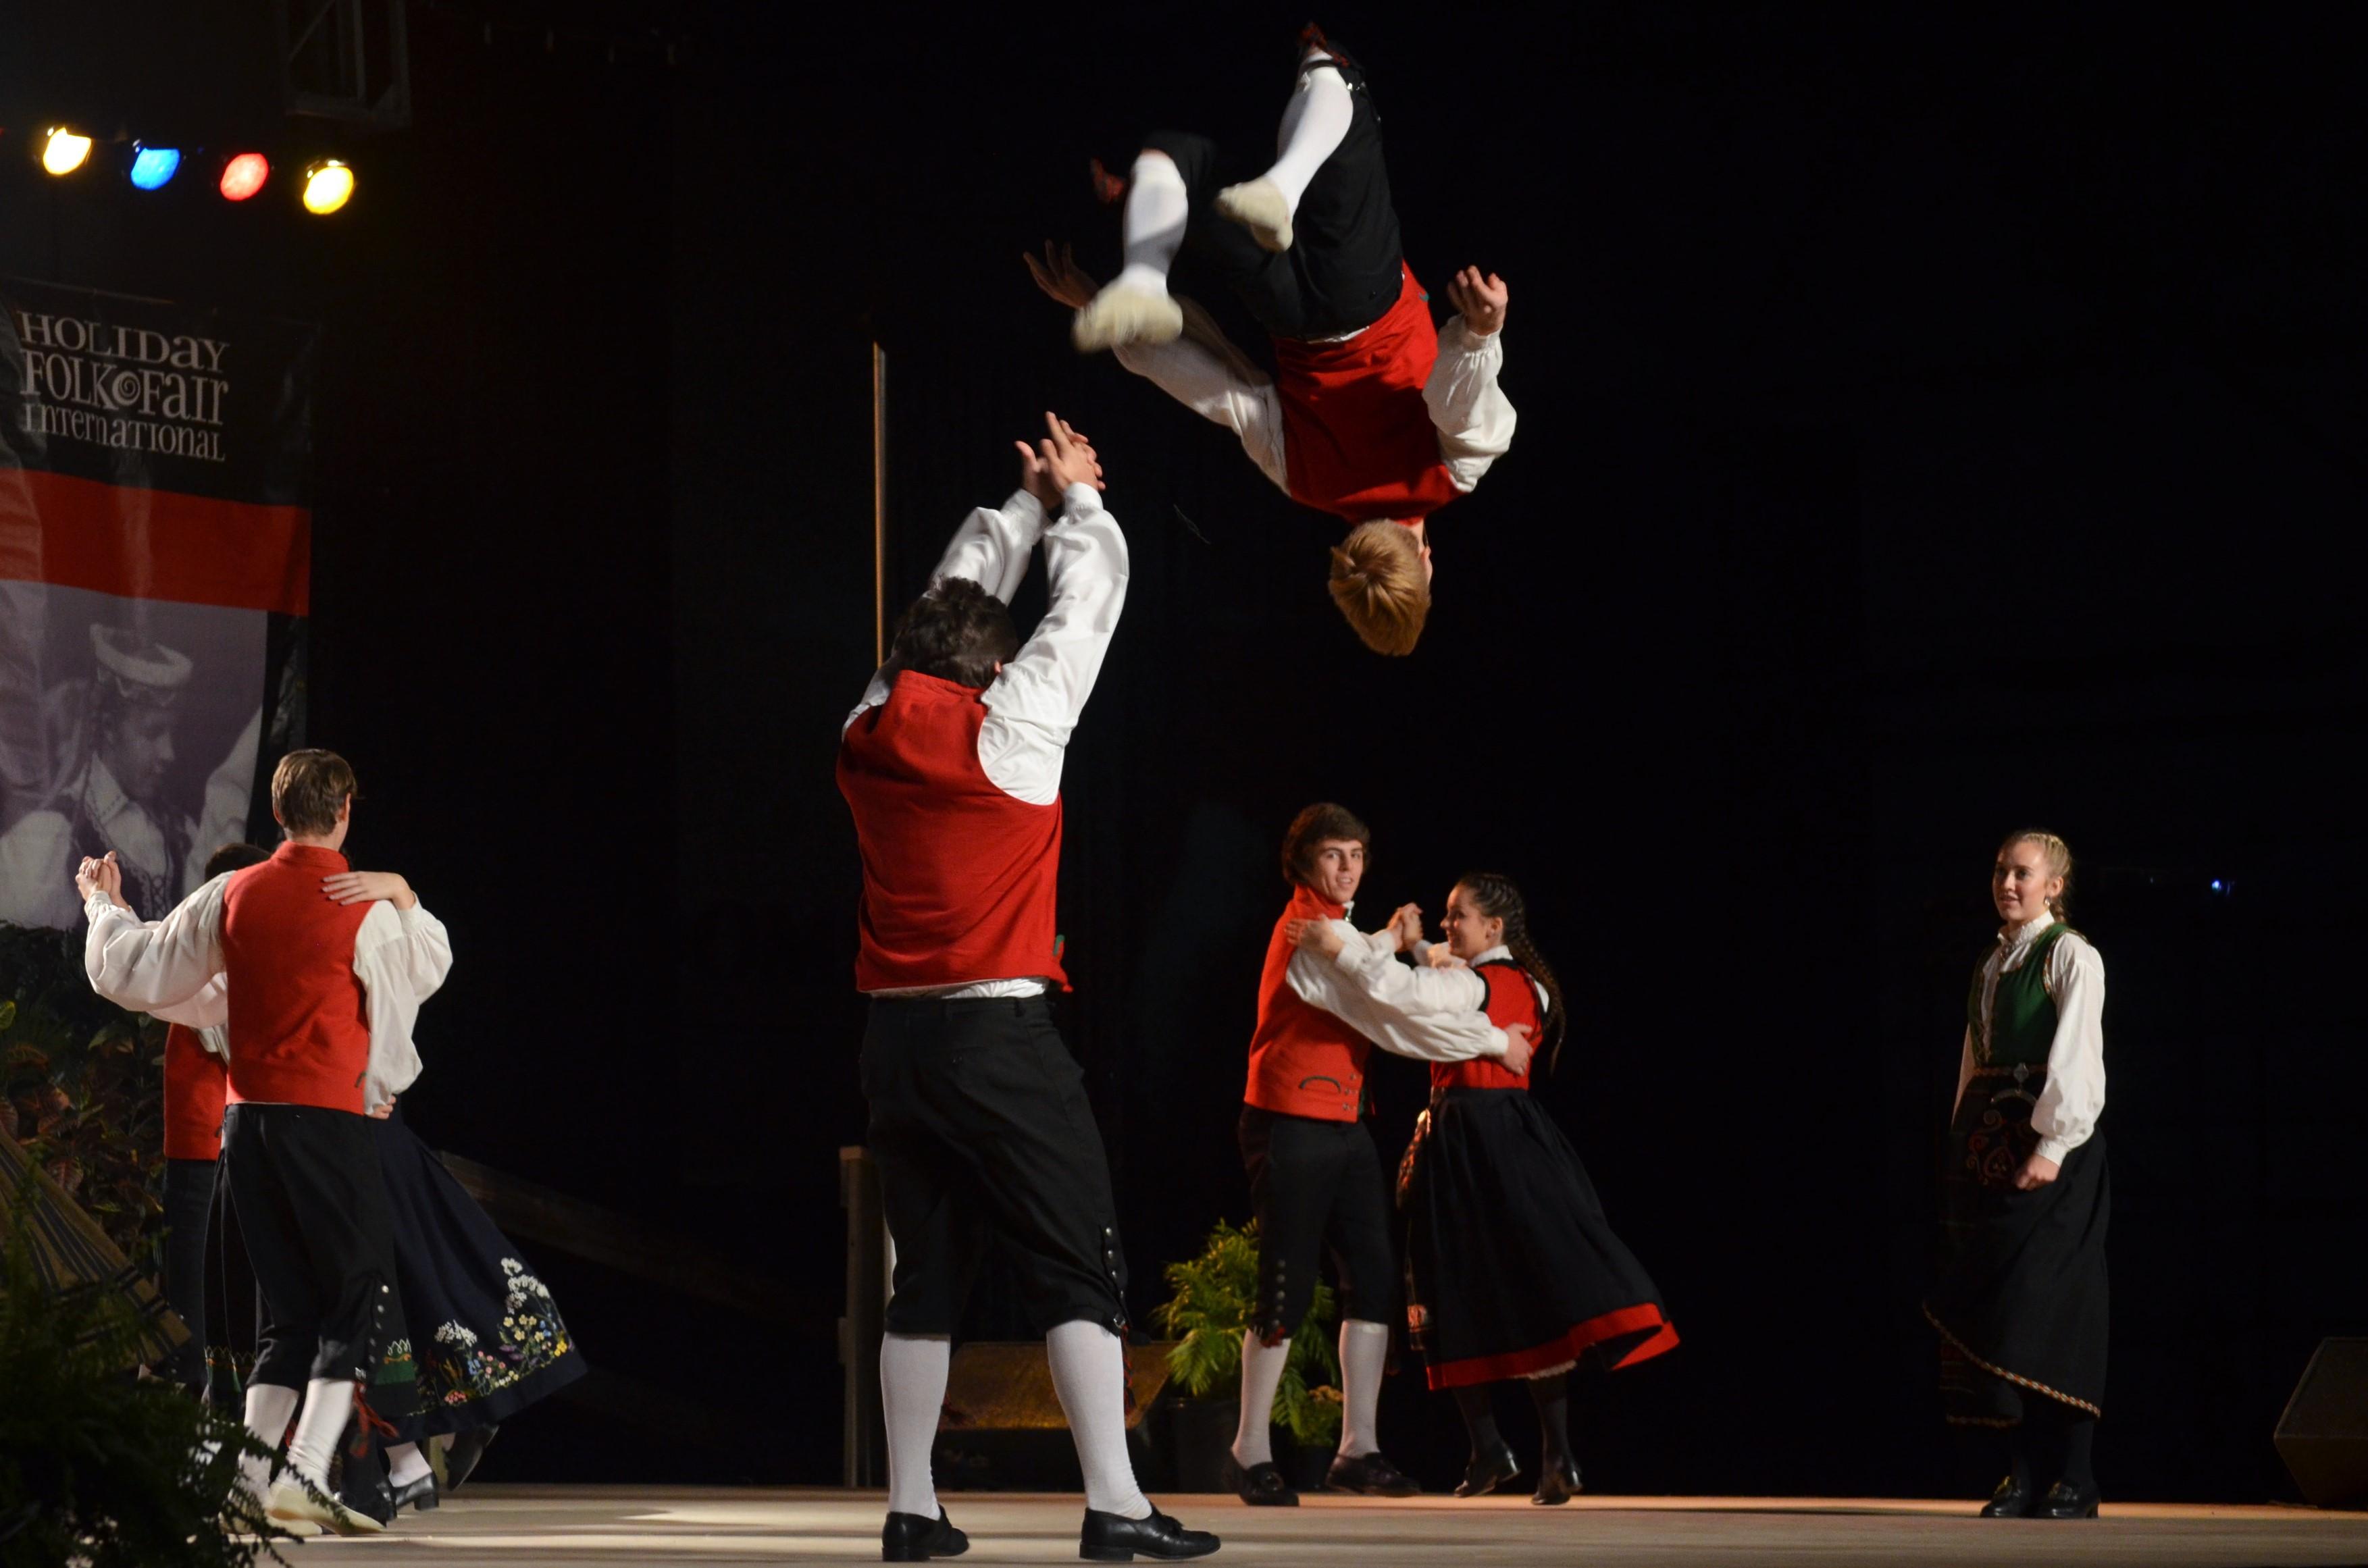 Scandinavian dance group. Photo by Jack Fennimore.